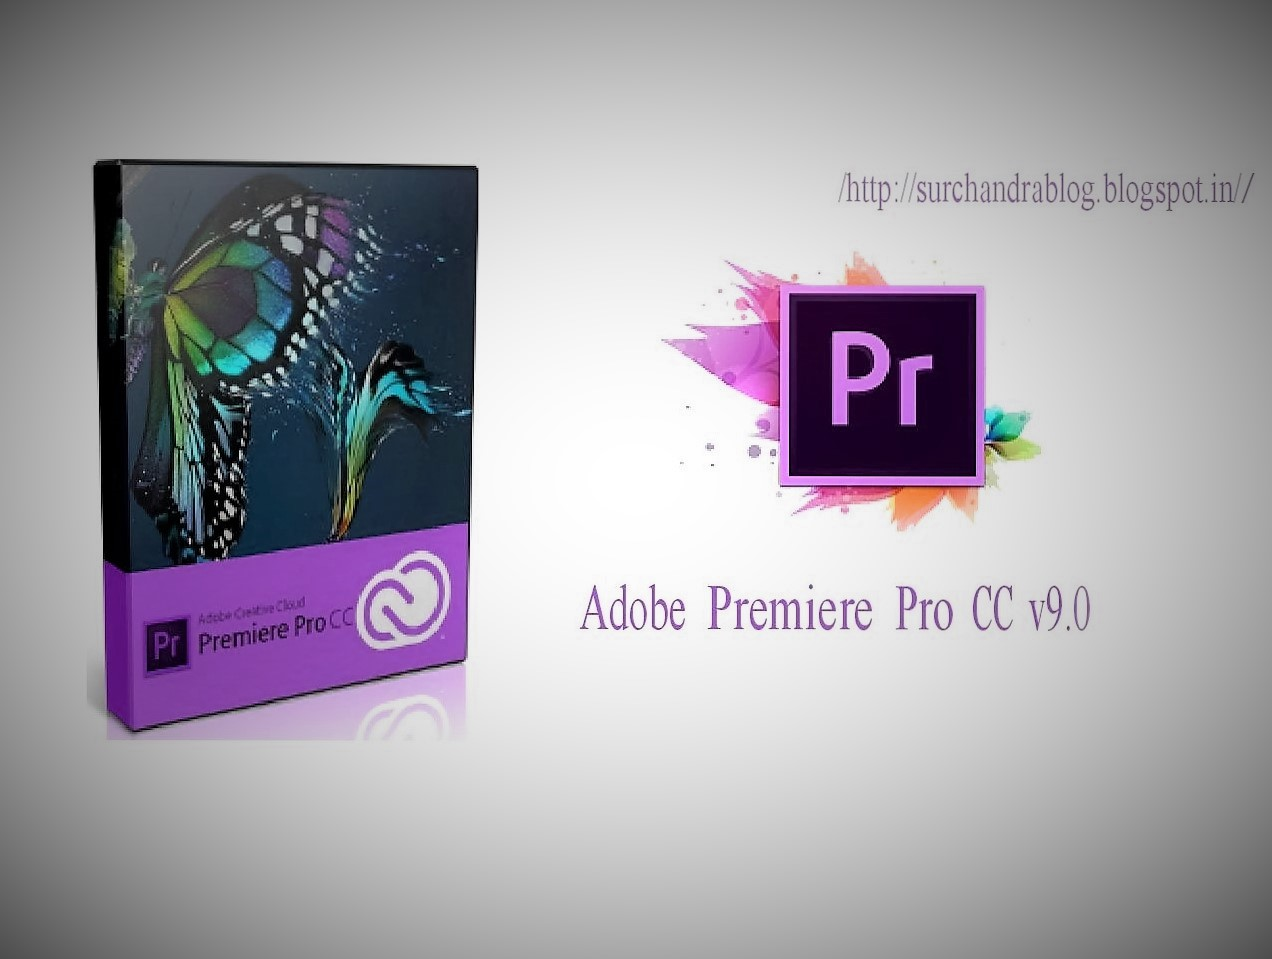 adobe premiere pro cc 2015 v9 0 crack 32 bit